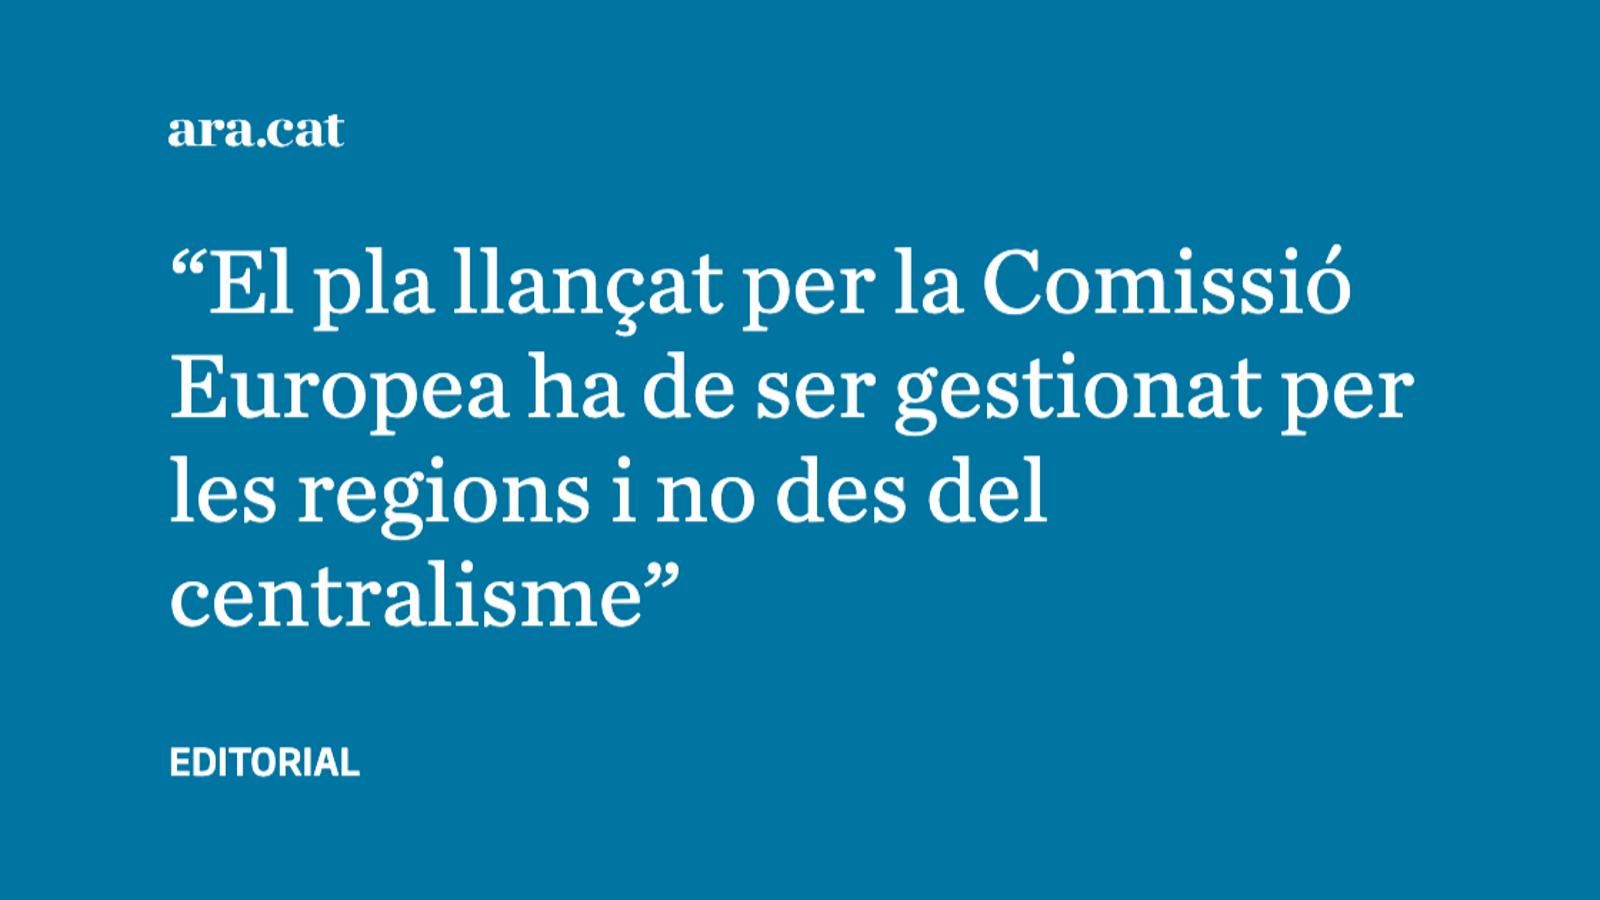 Ajudes europees i principi de subsidiarietat